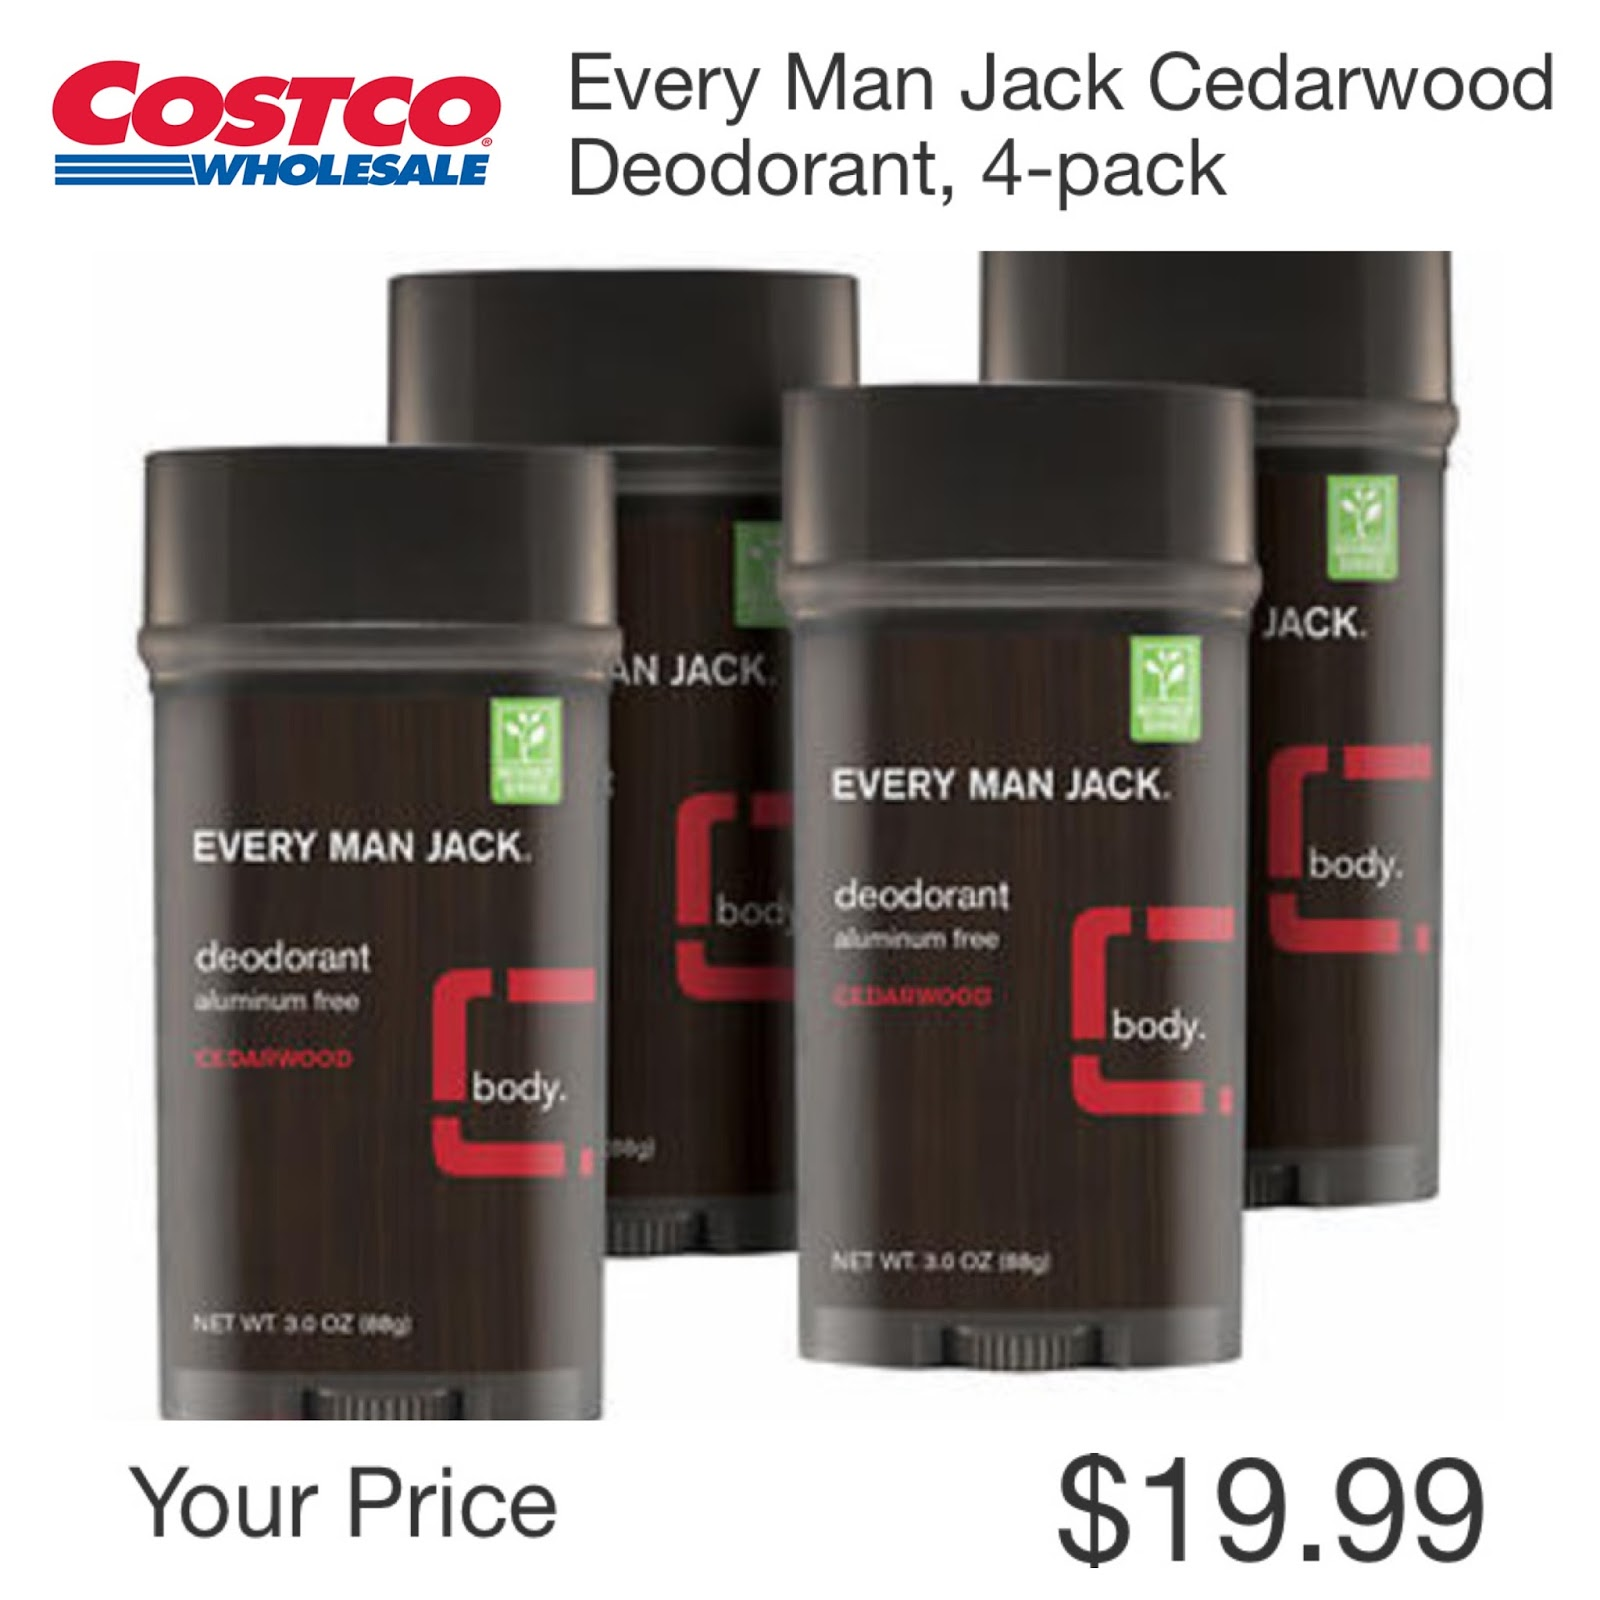 Natural, Aluminum Free Deodorants at Costco! – The Costco Connoisseur